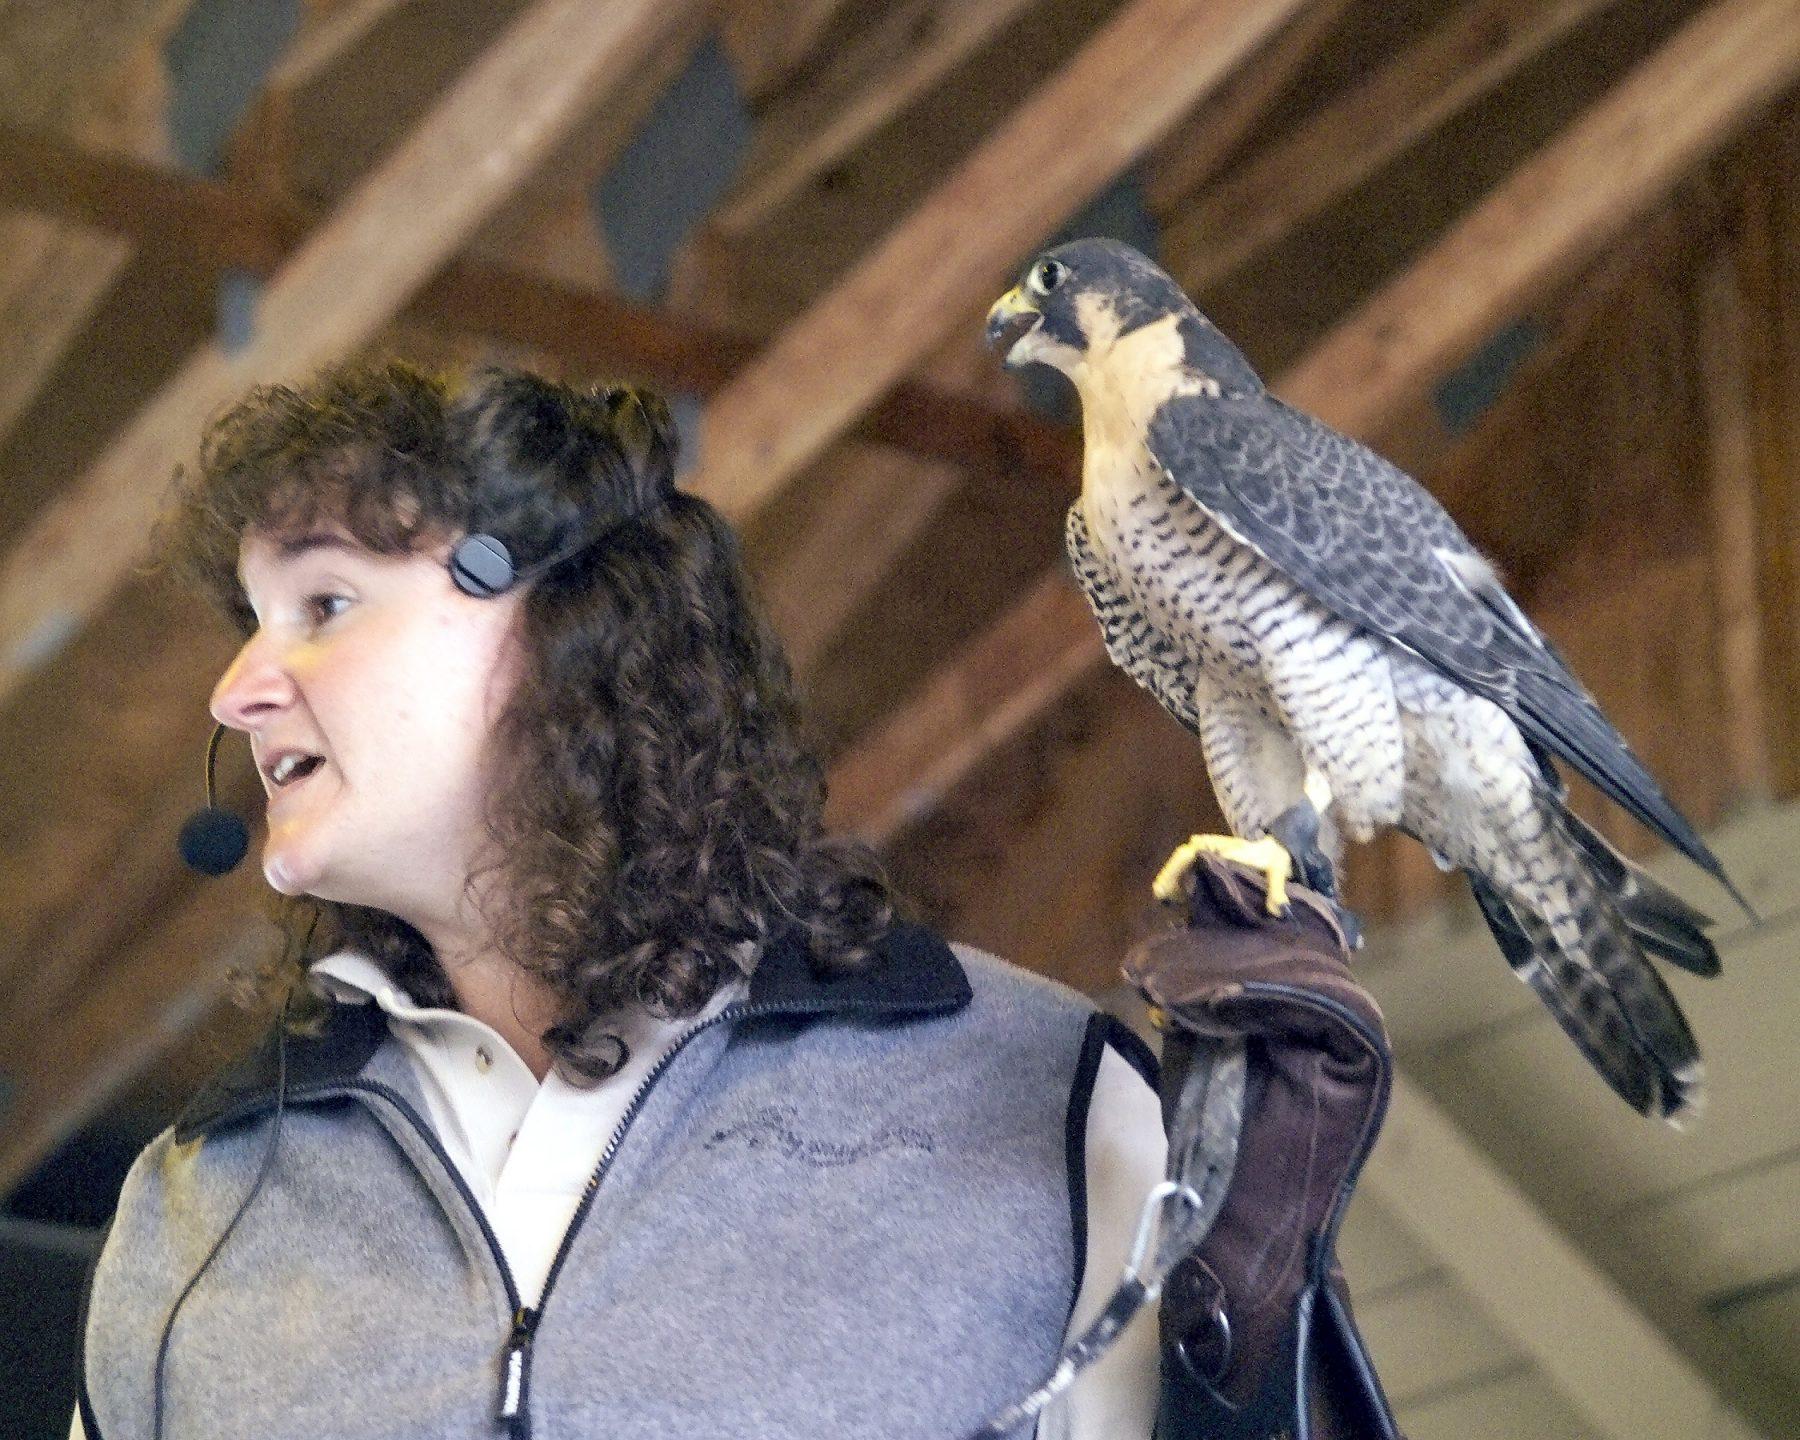 Beth Bidwell of Wild Things brings along birds of prey & reptiles